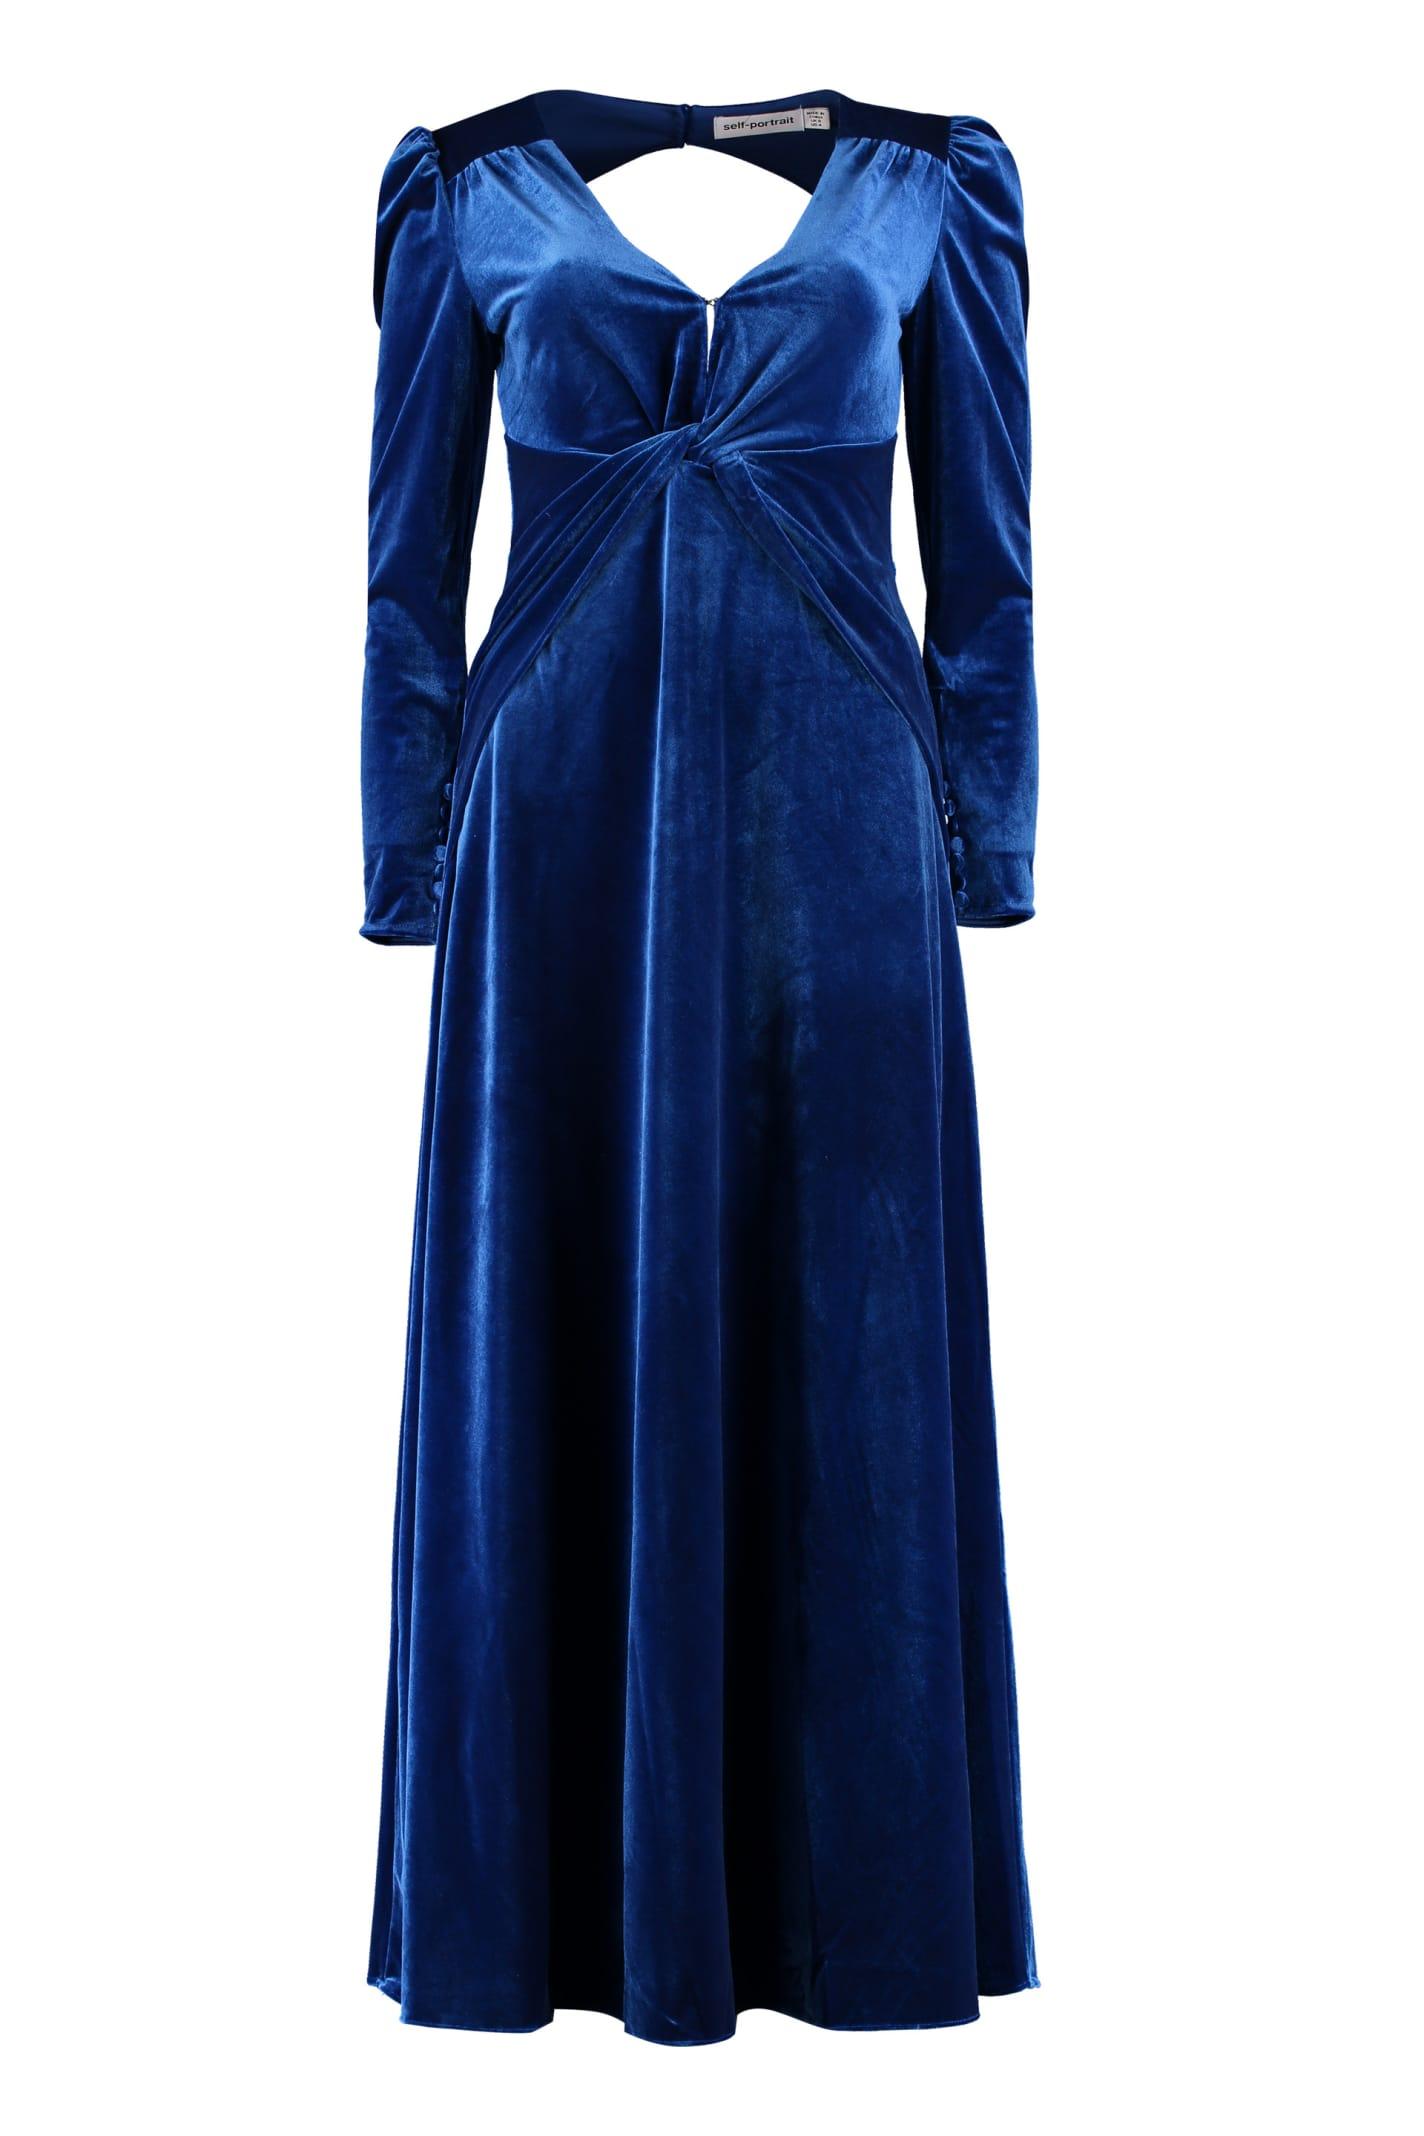 Buy self-portrait Velvet Dress online, shop self-portrait with free shipping